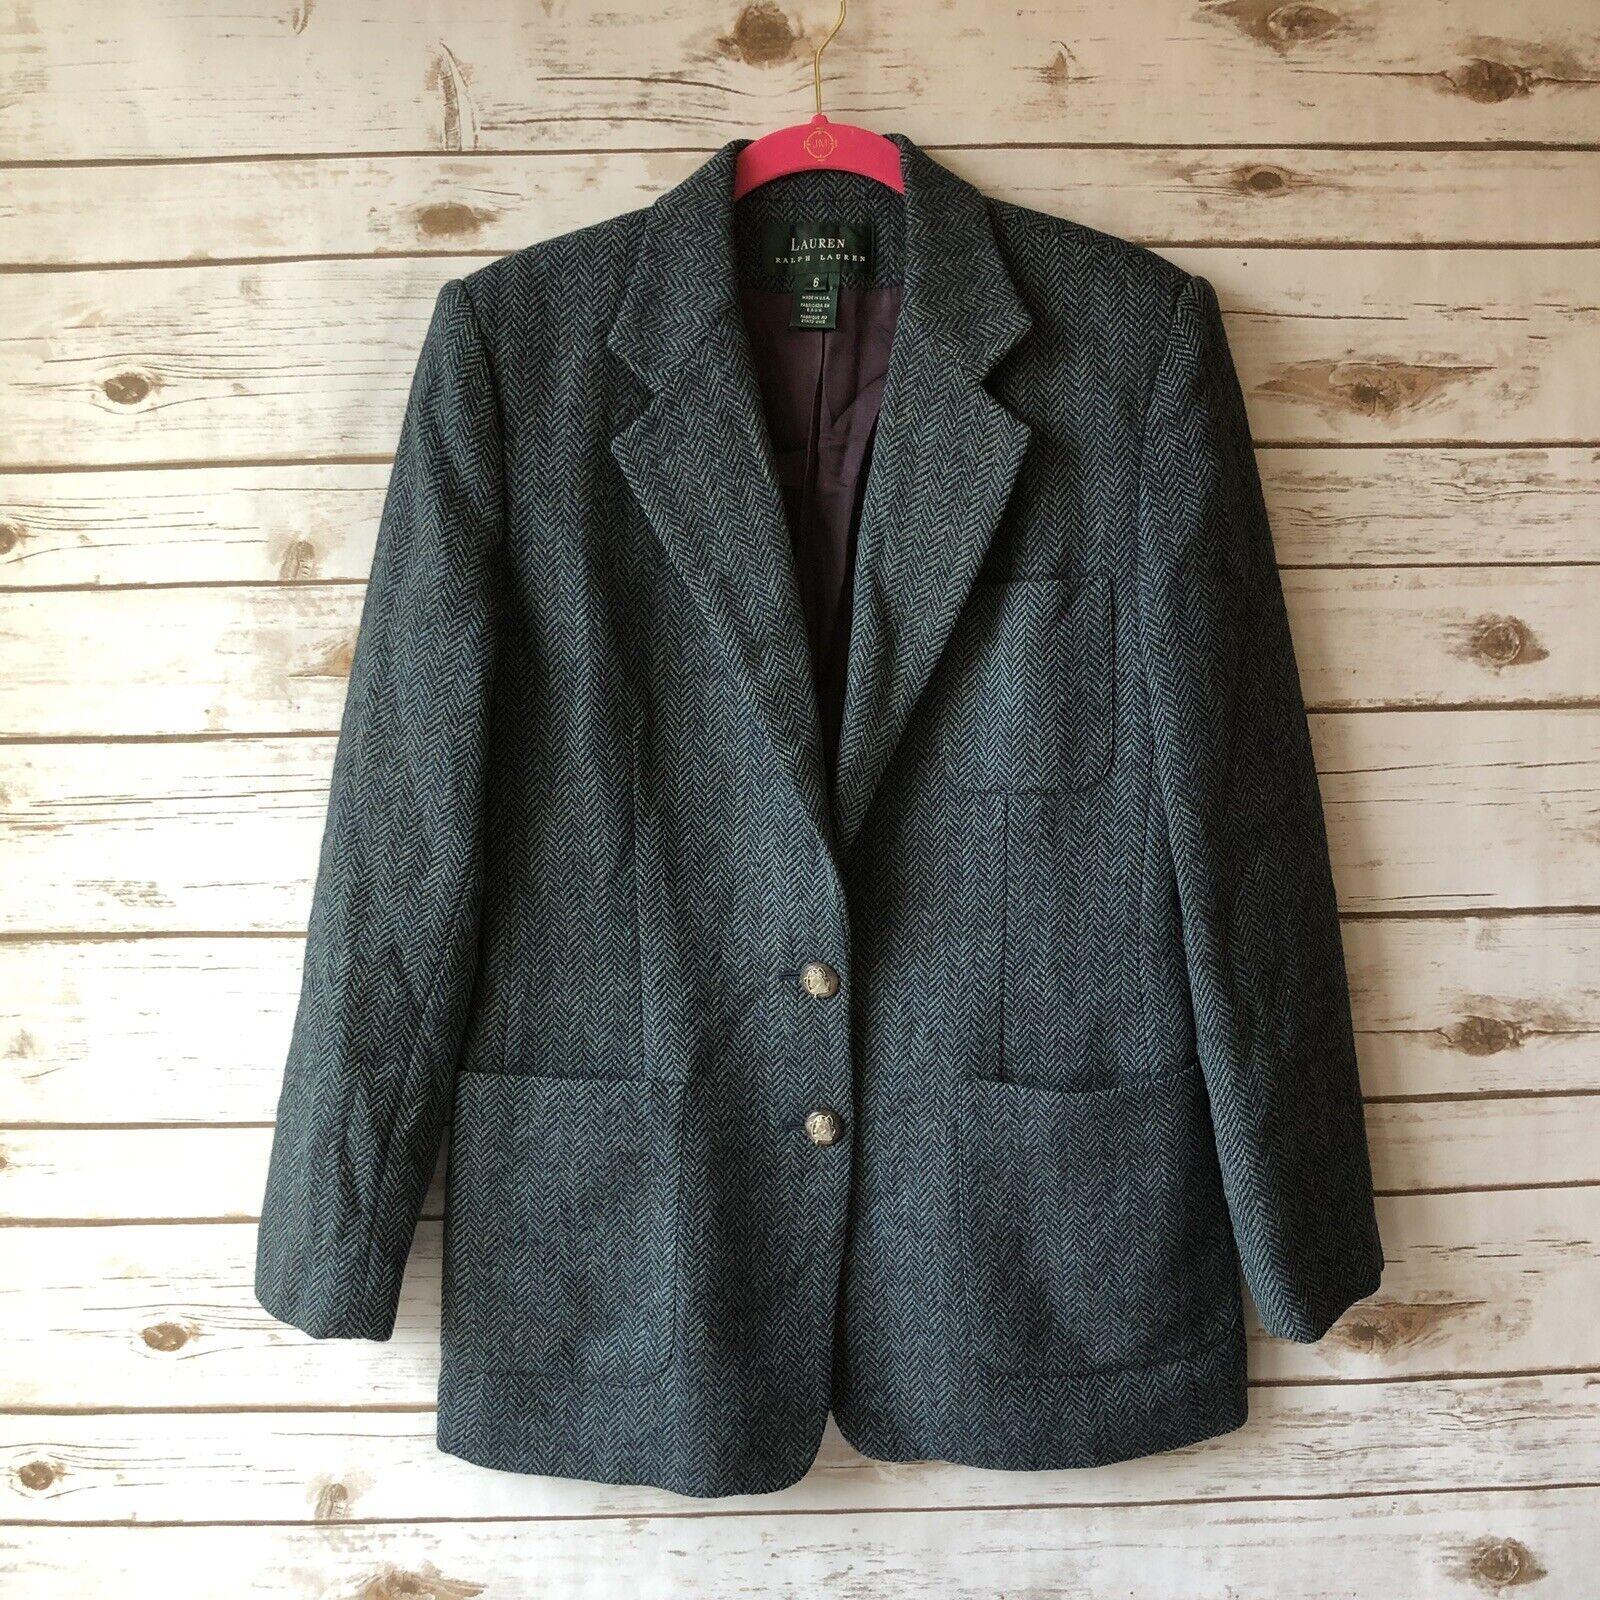 LRL Ralph Lauren Sz 6 bluee Herringbone 100% Shetland Wool Equestrian Blazer